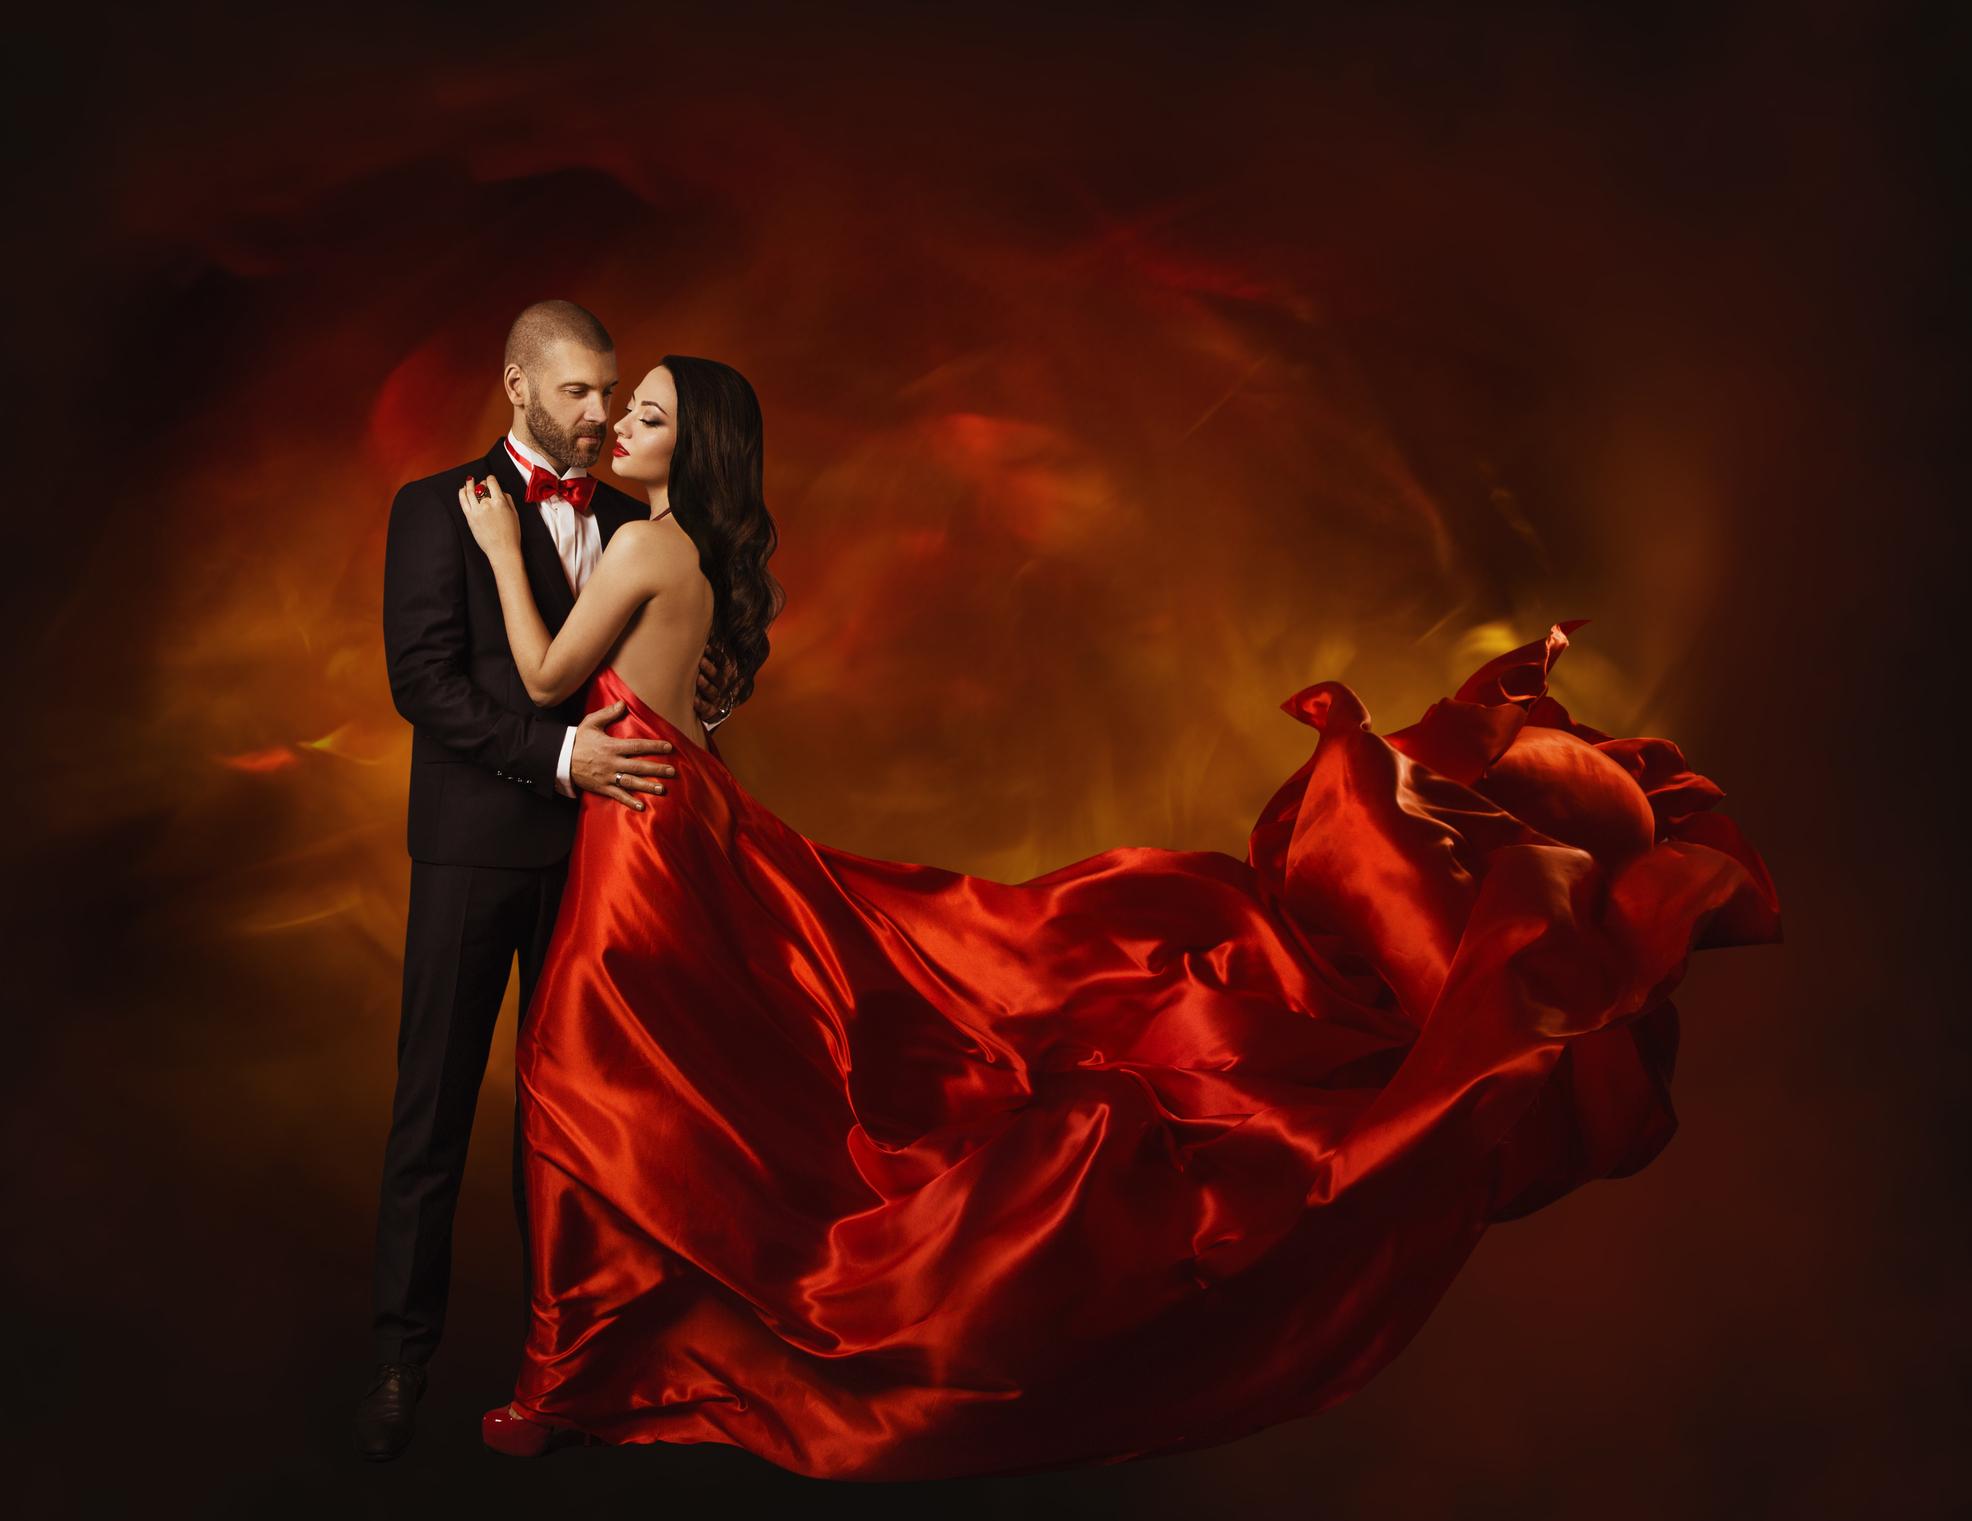 Elegant couple romantic dancing.Photo by inarik/iStock / Getty Images